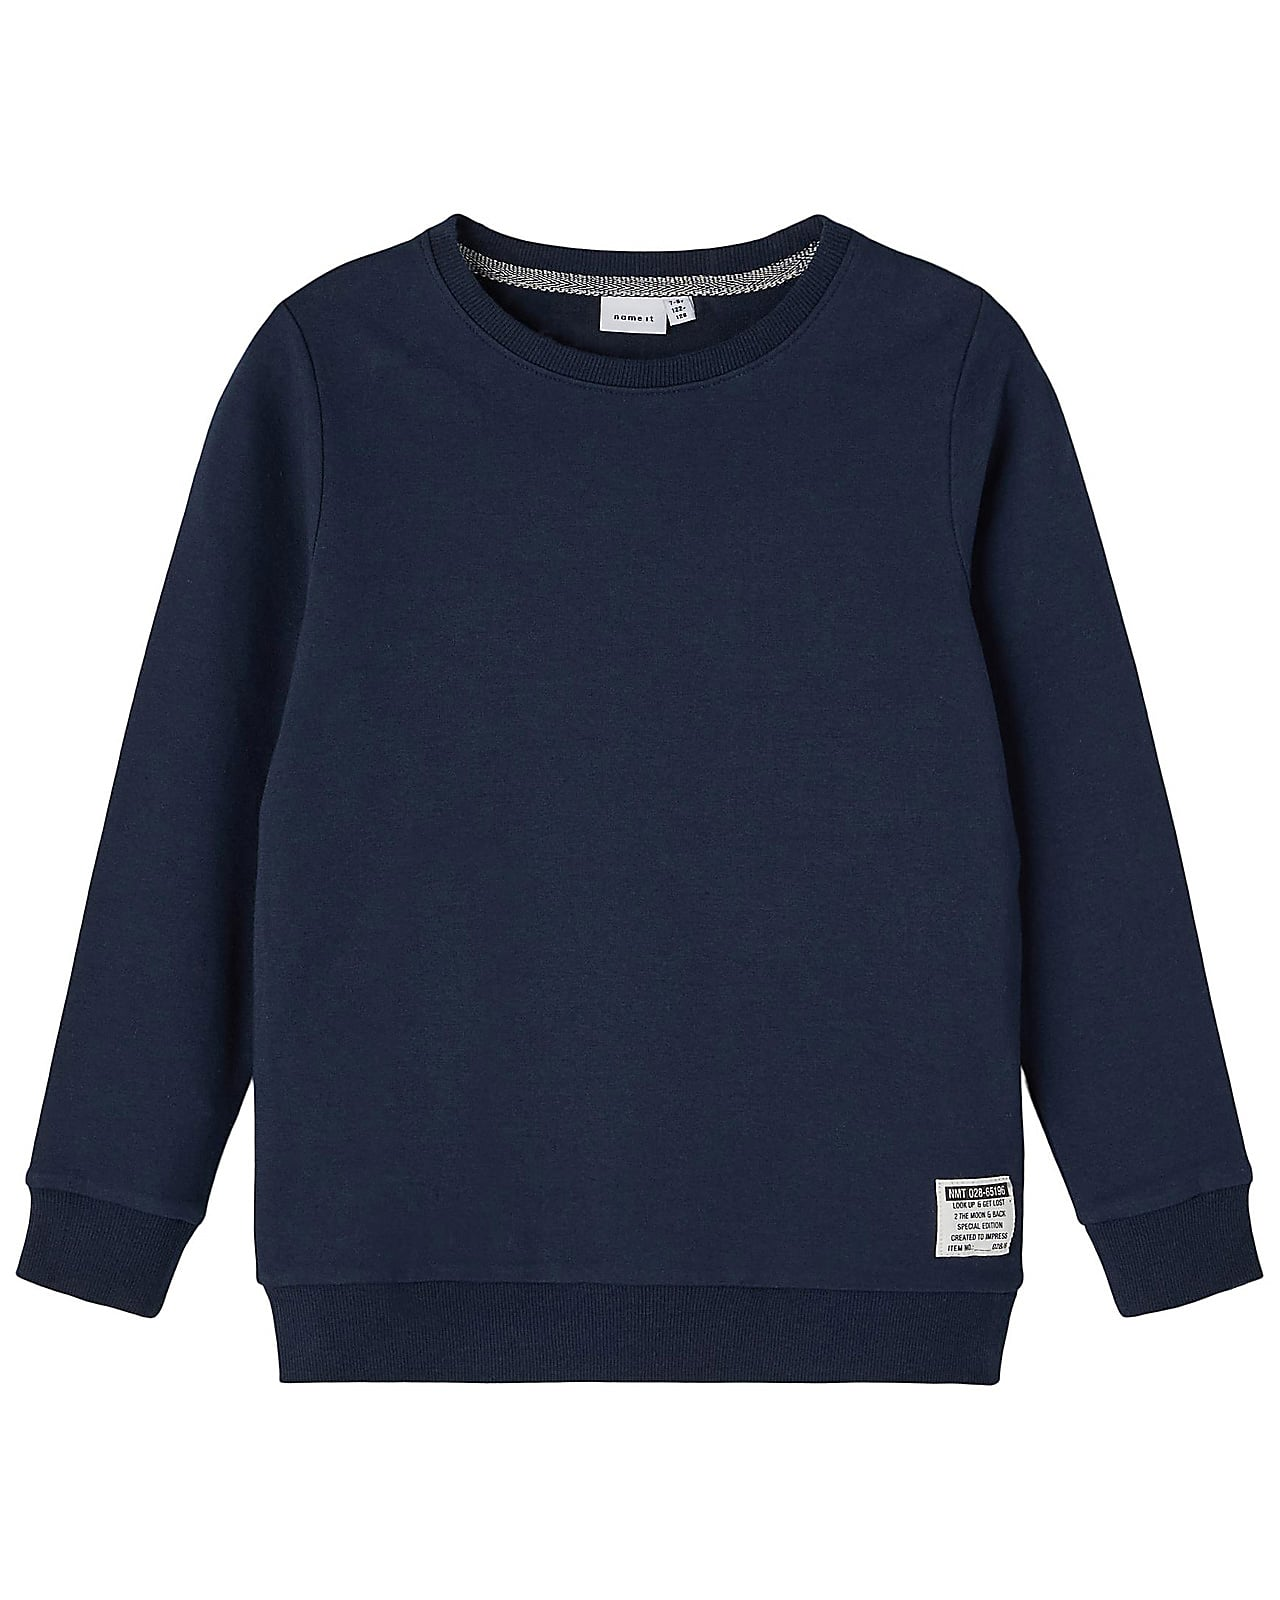 Name It sweatshirt, Honk, darksapphire